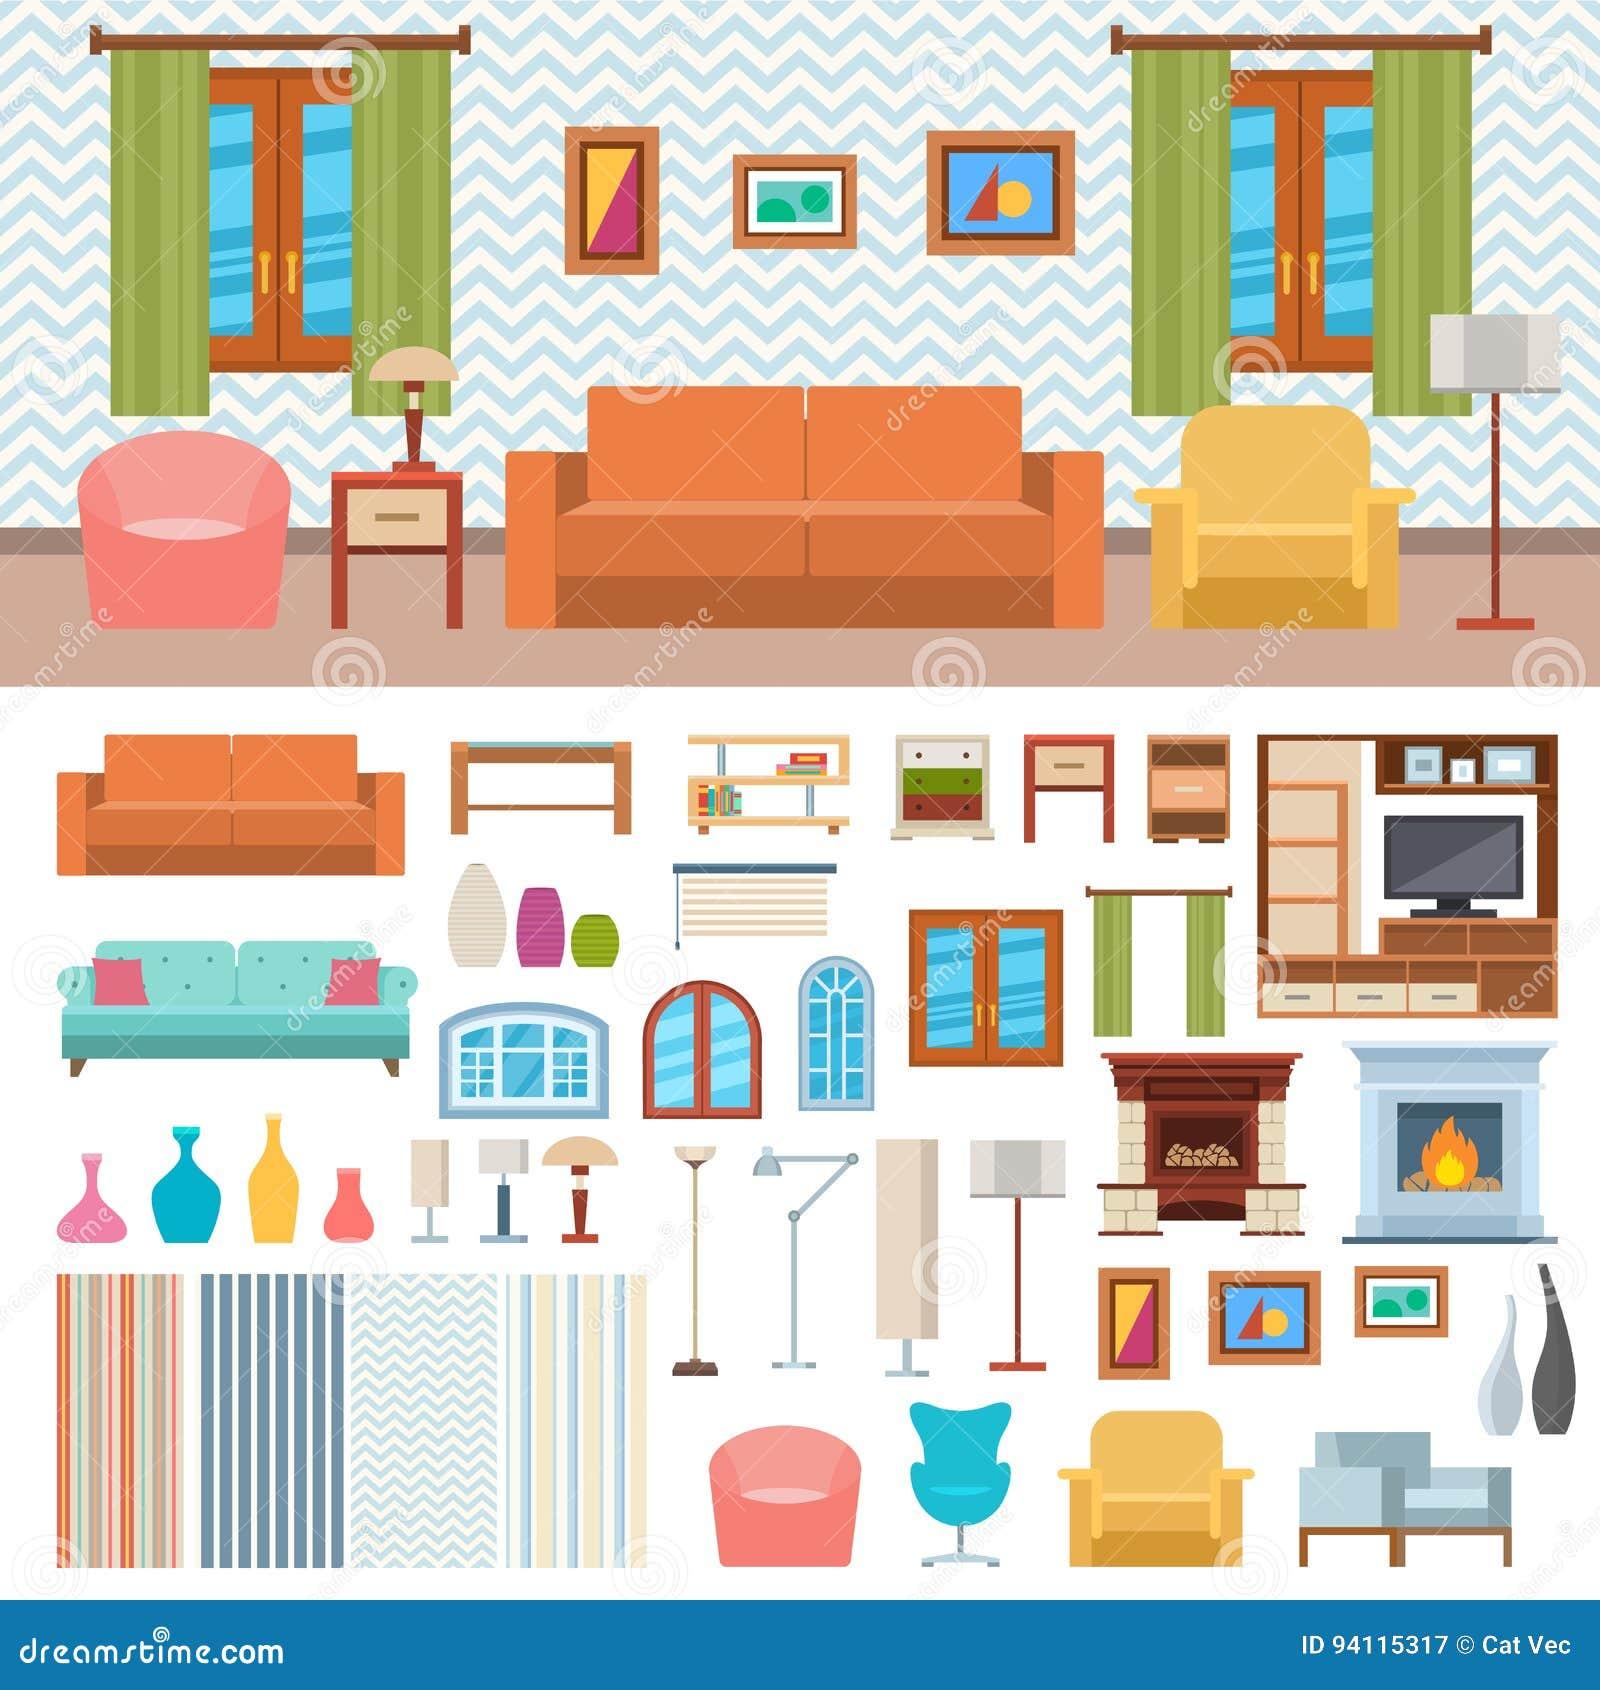 Set Interior Design House Rooms Furniture Stock Vector: Furniture Room Interior Design And Home Decor Concept Icon